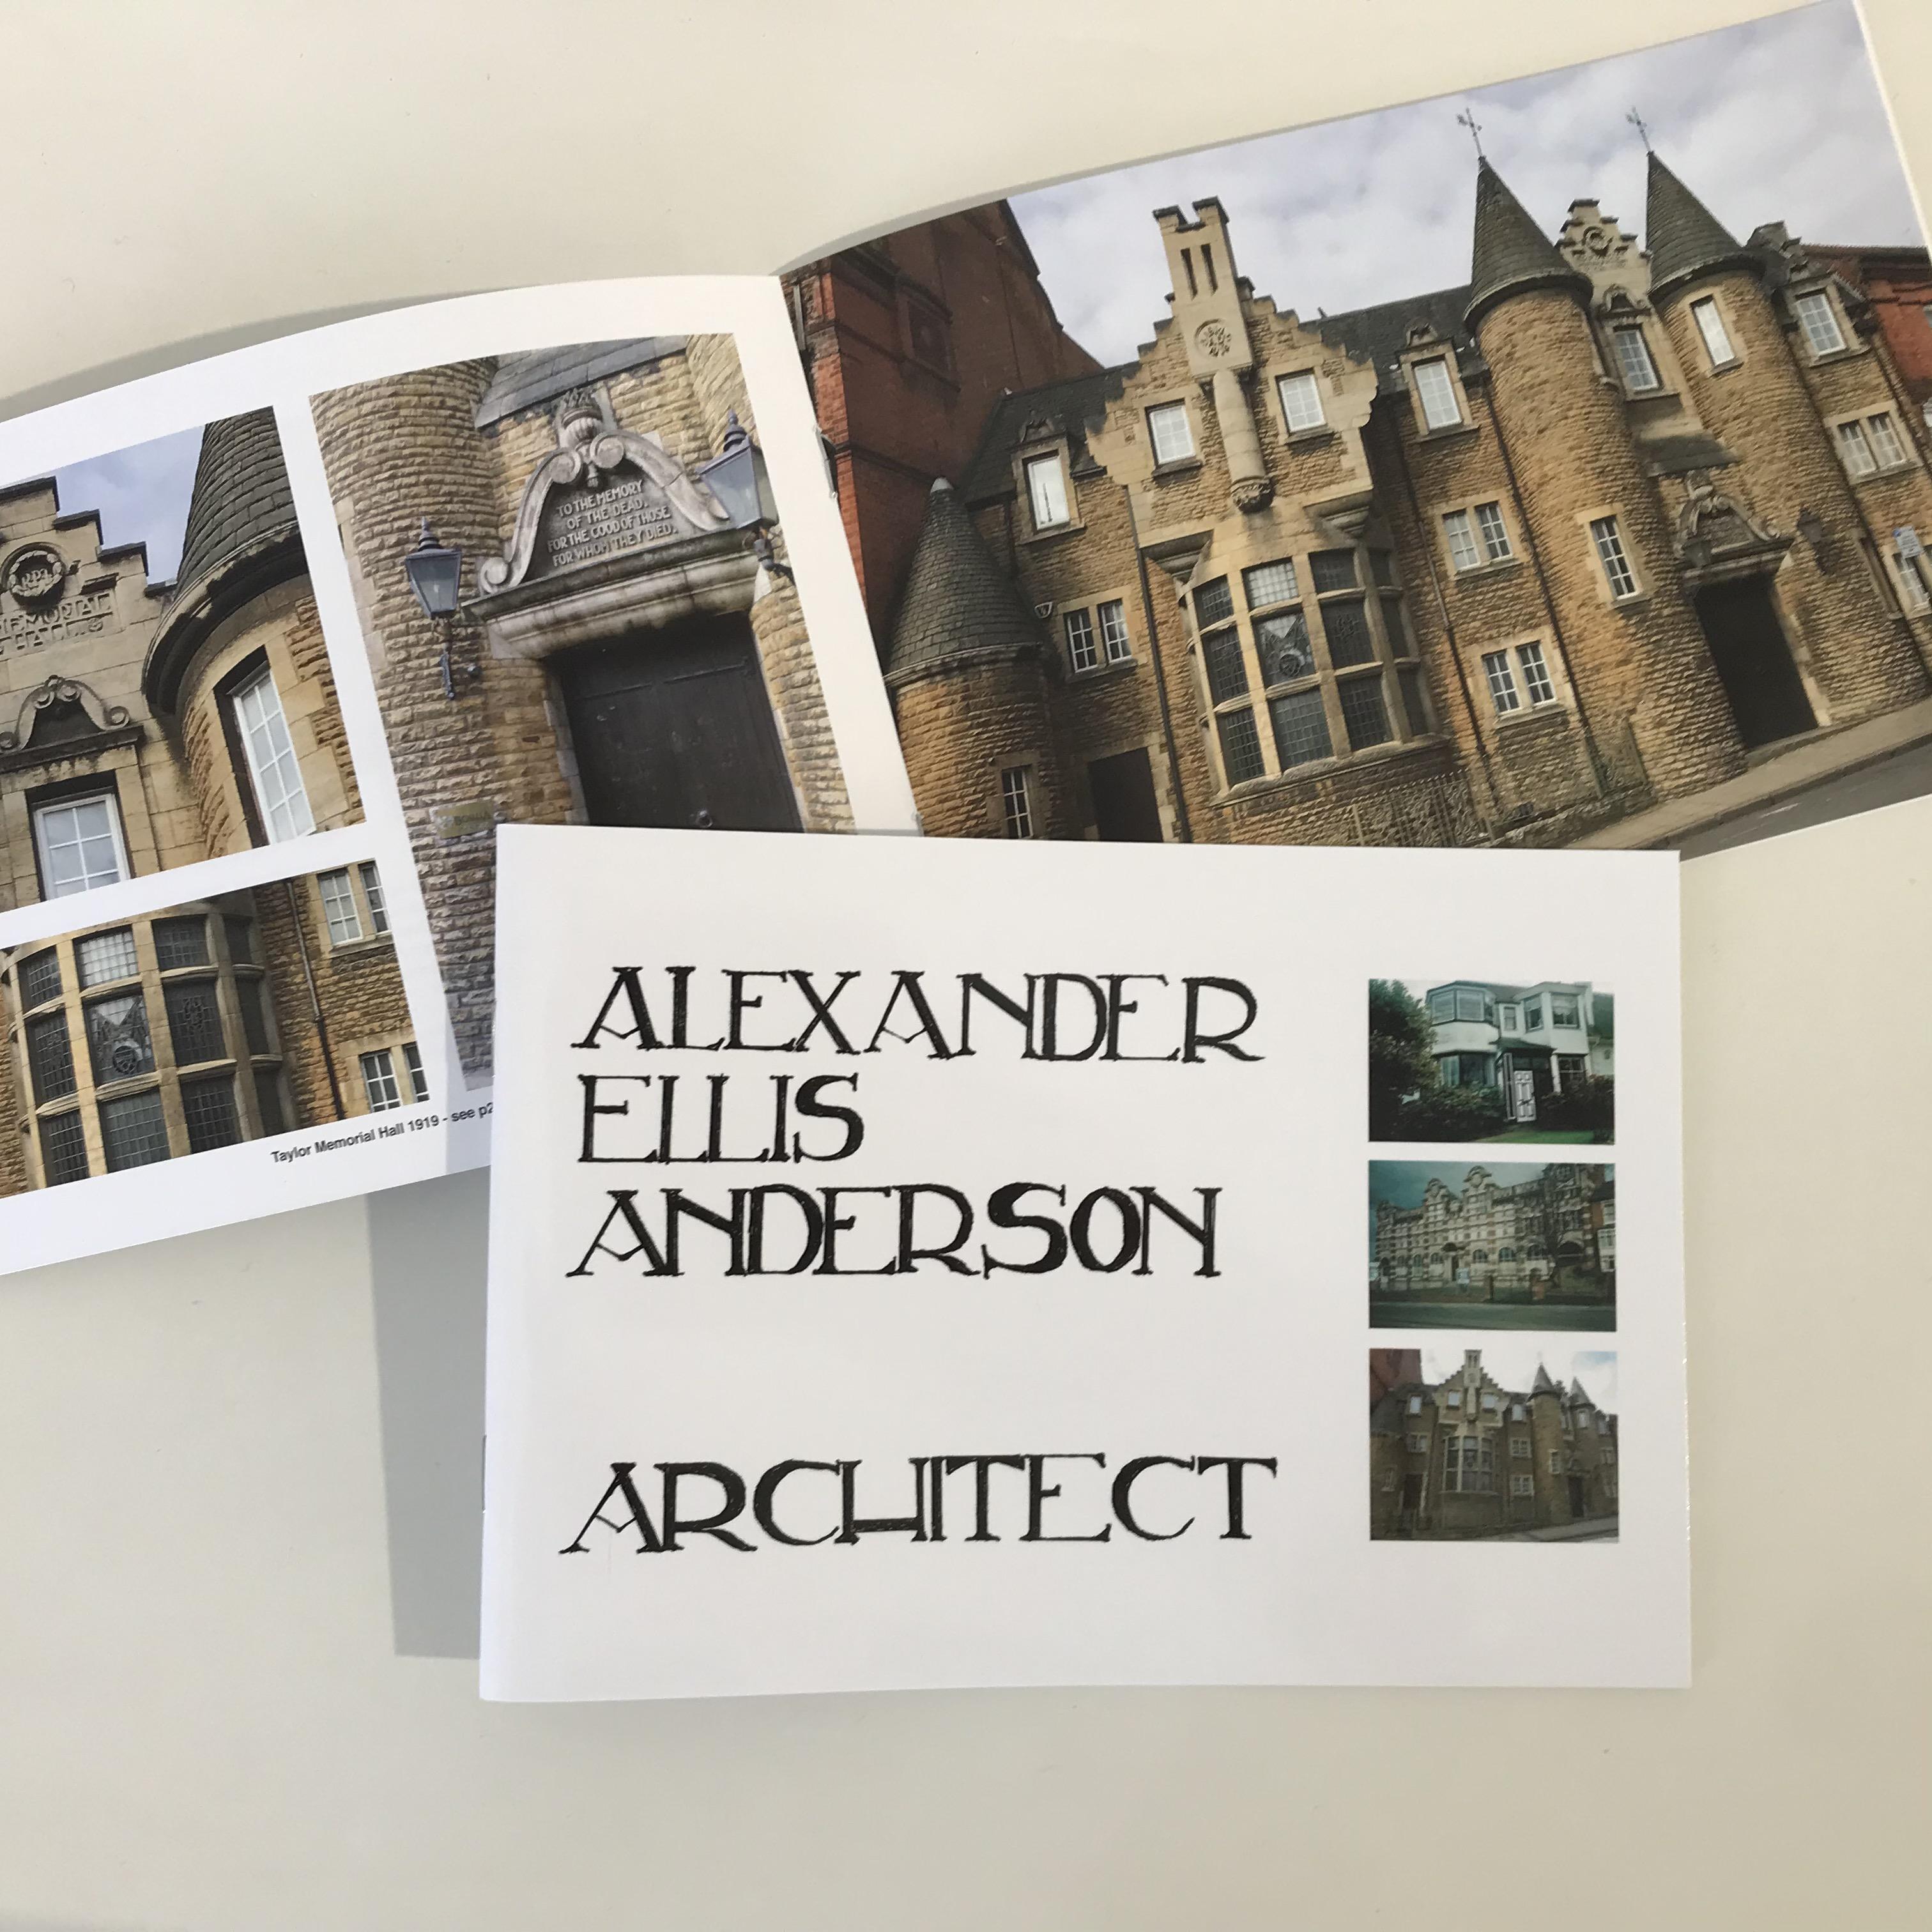 Alexander Ellis Anderson - Architect